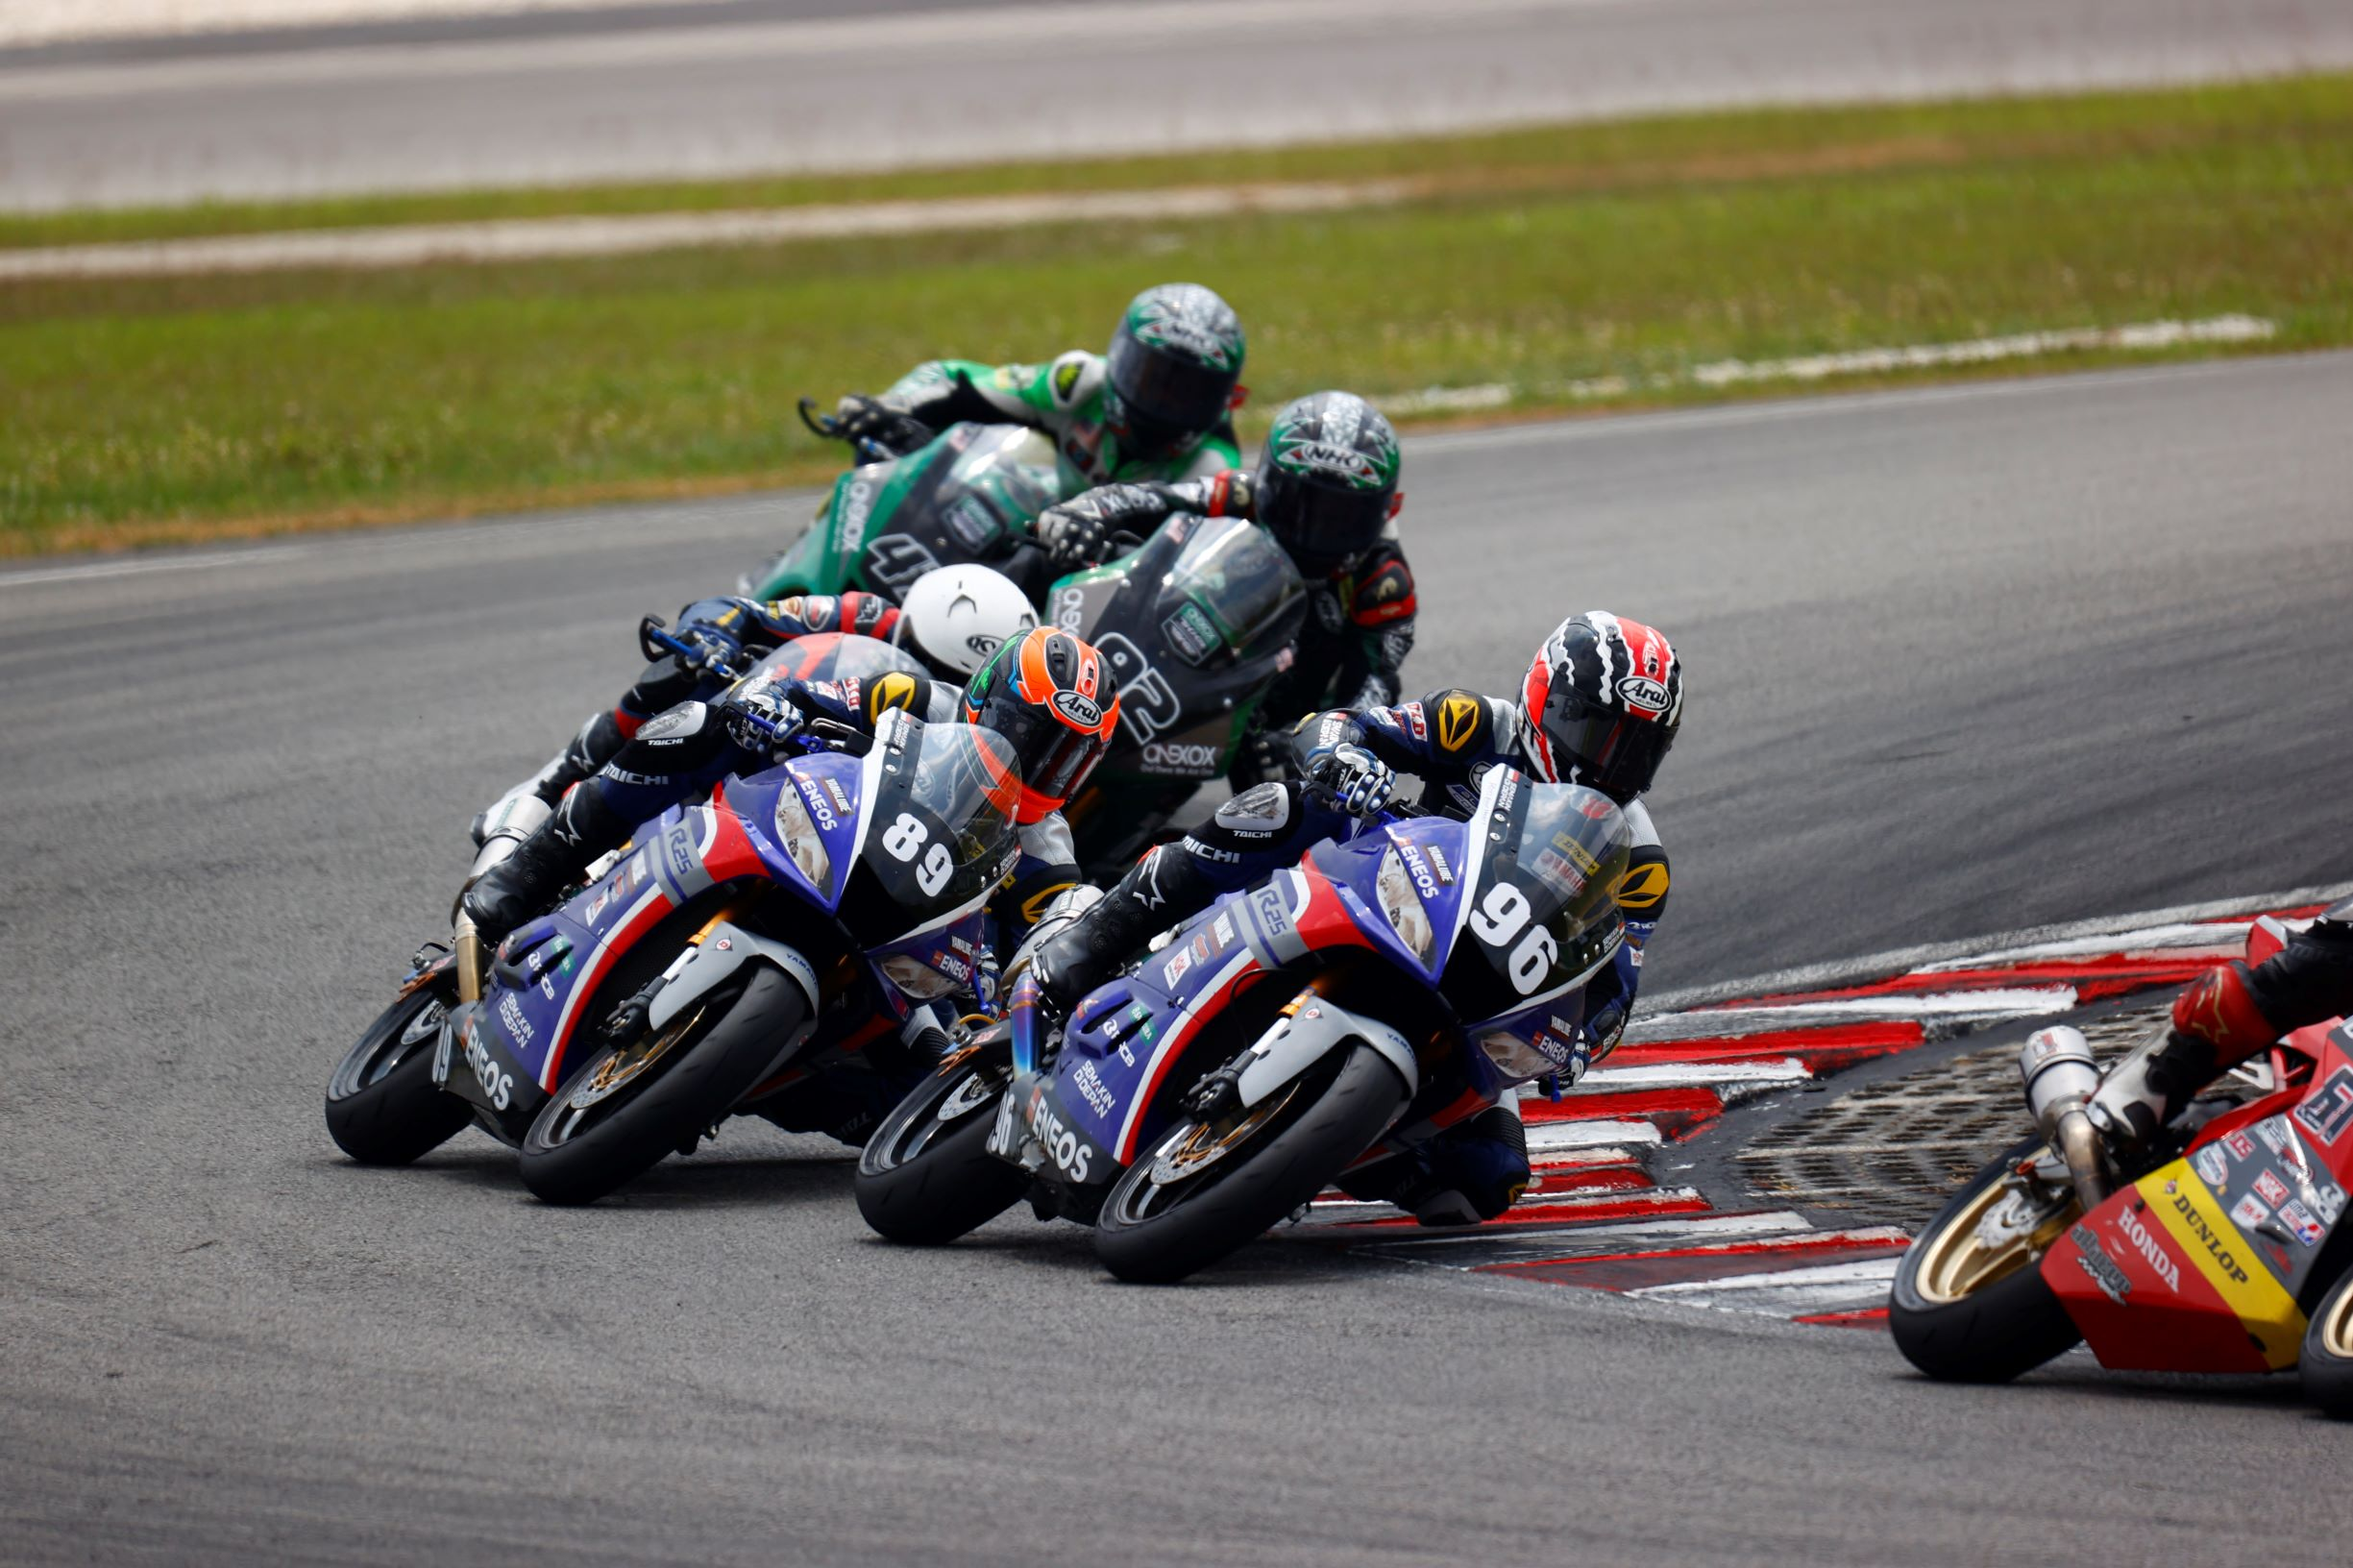 Pebalap Yamaha Masih 'Lemah' di Seri Pembuka ARRC 2020 Sepang